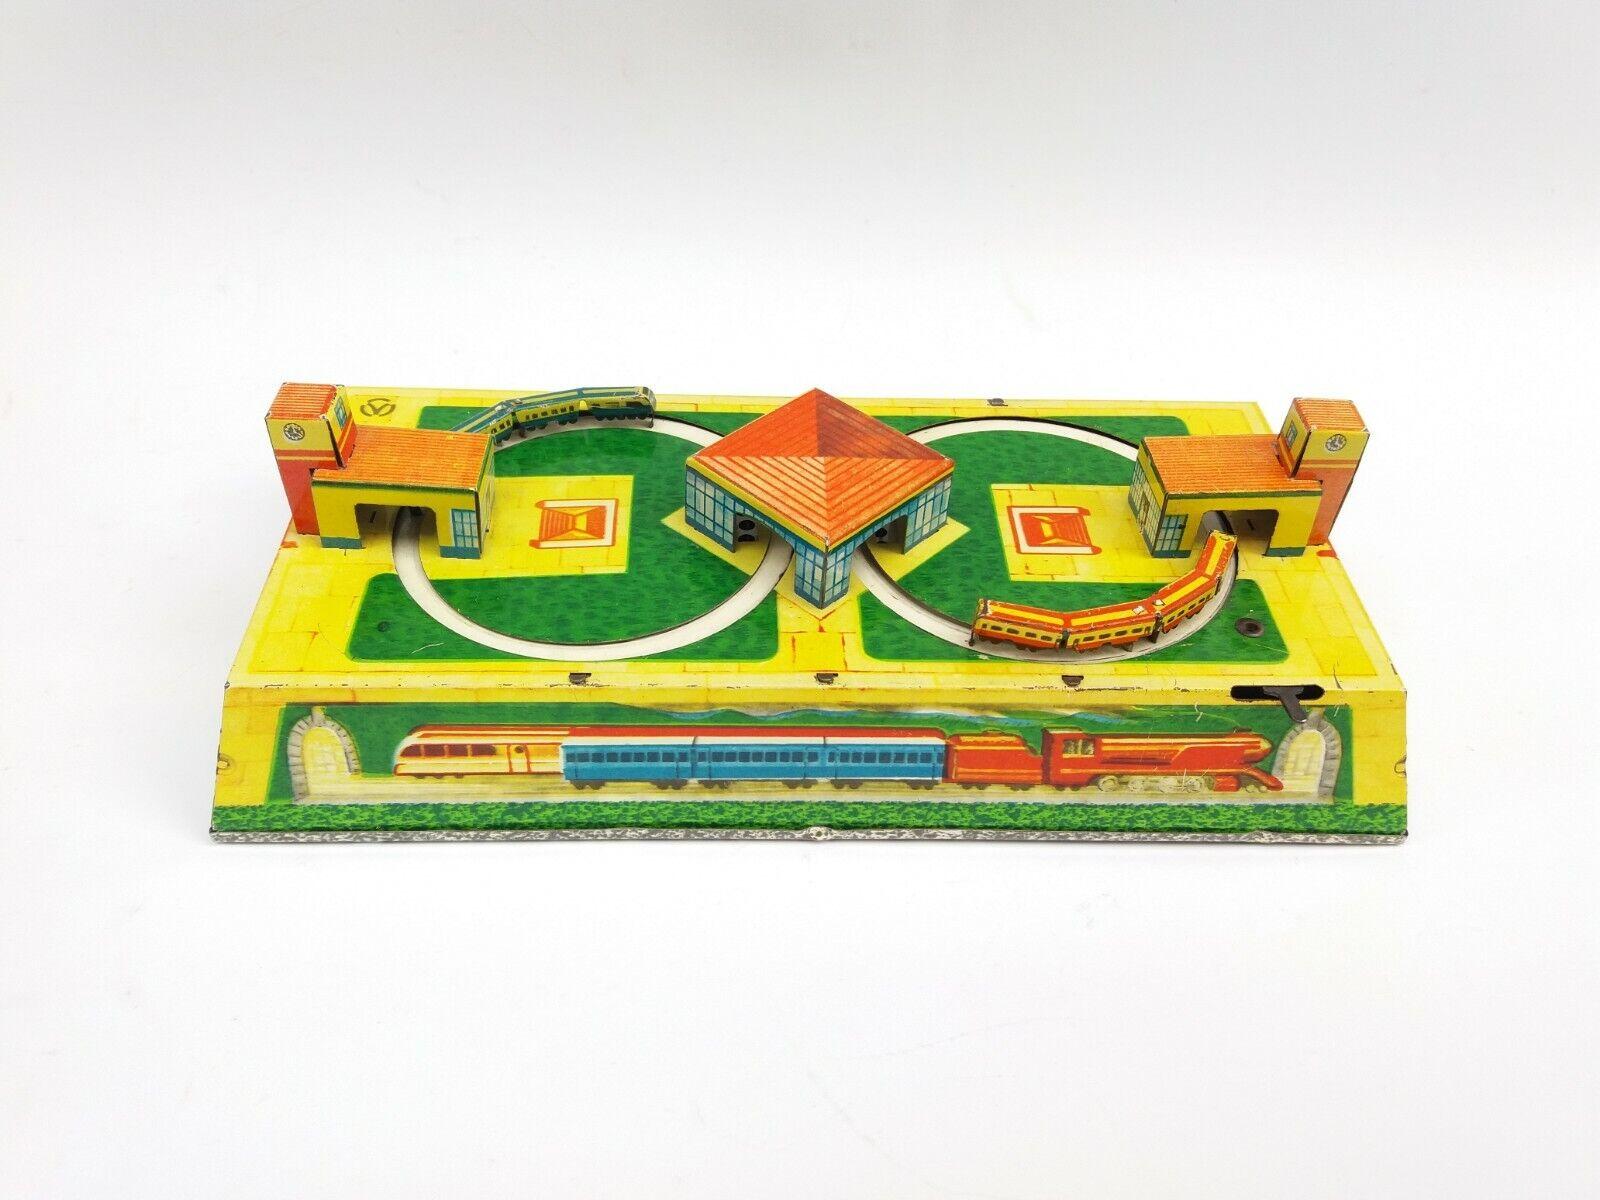 VINTAGE OLD TIN TOY TRAIN STATION MECHANICAL WIND-UP WIND-UP WIND-UP LOCOMOTIVE WORKS 1950's 09cc54